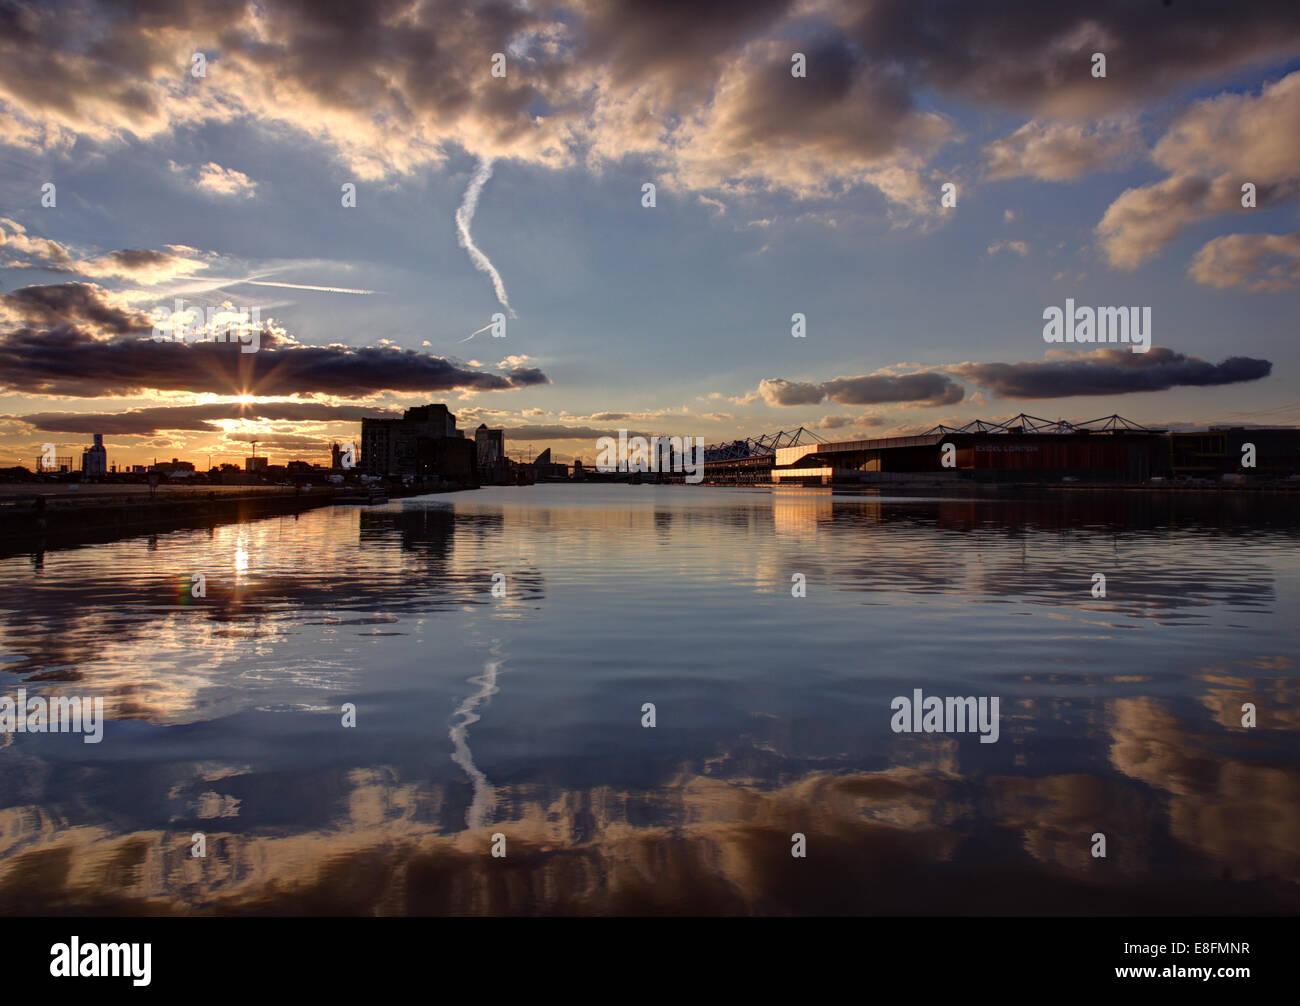 United Kingdom, England, London, Royal Victoria Docks at Canary Wharf - Stock Image